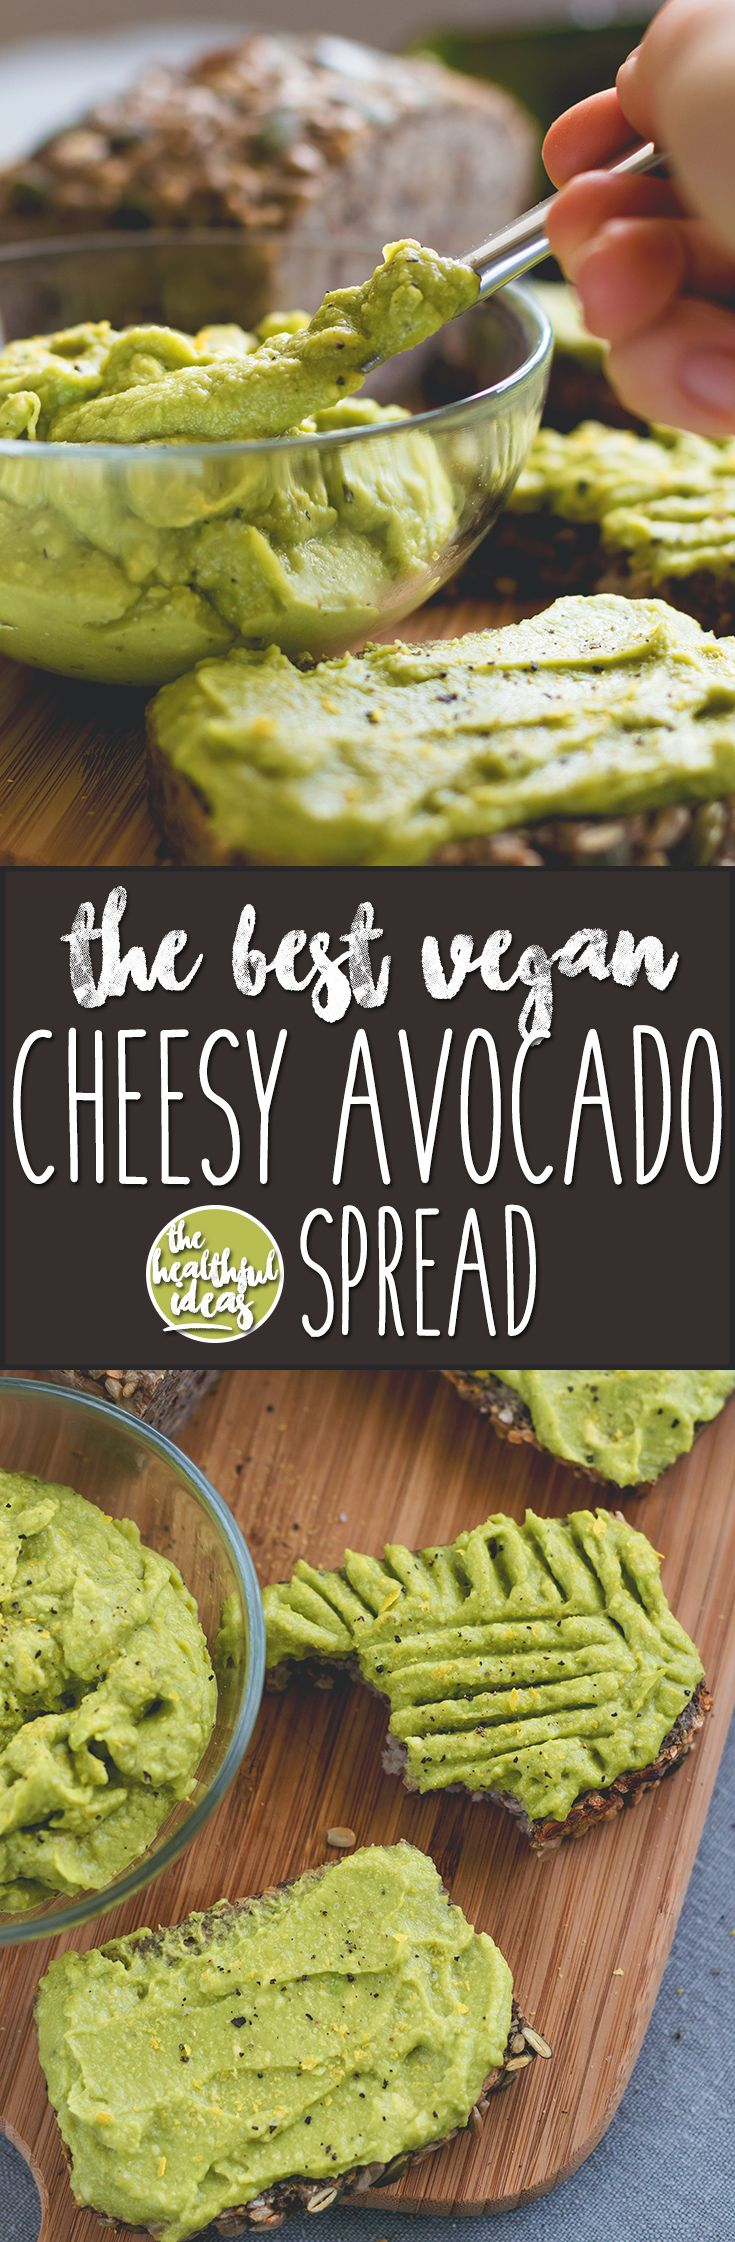 The Best Cheesy Vegan Spread